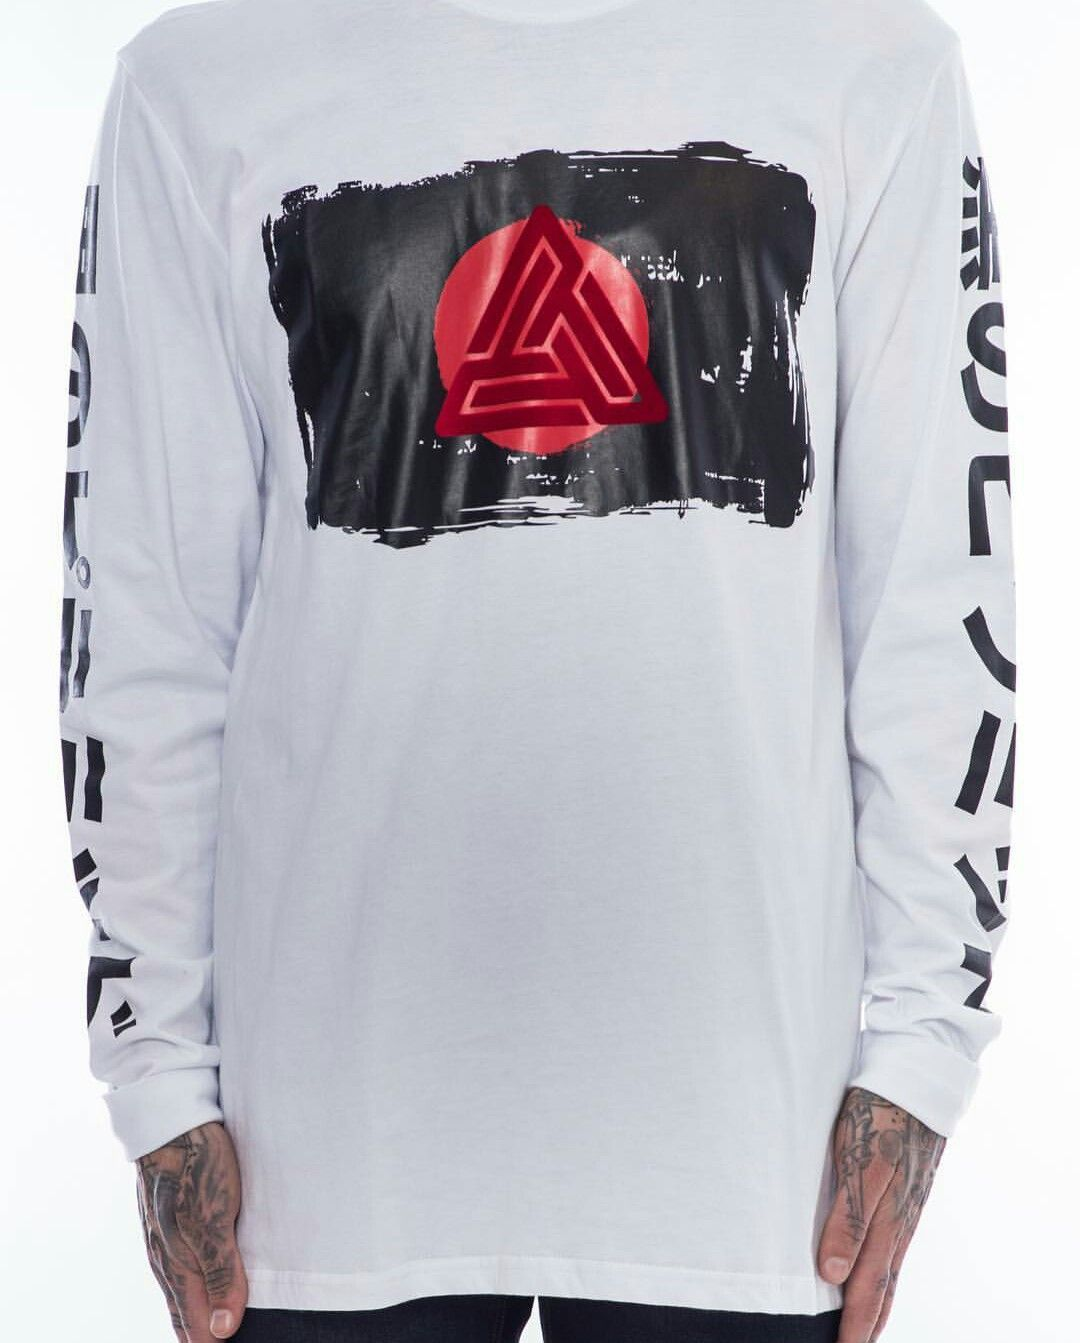 51783d09 Black Pyramid | Tees | Black pyramid chris brown, Pyramid clothing ...